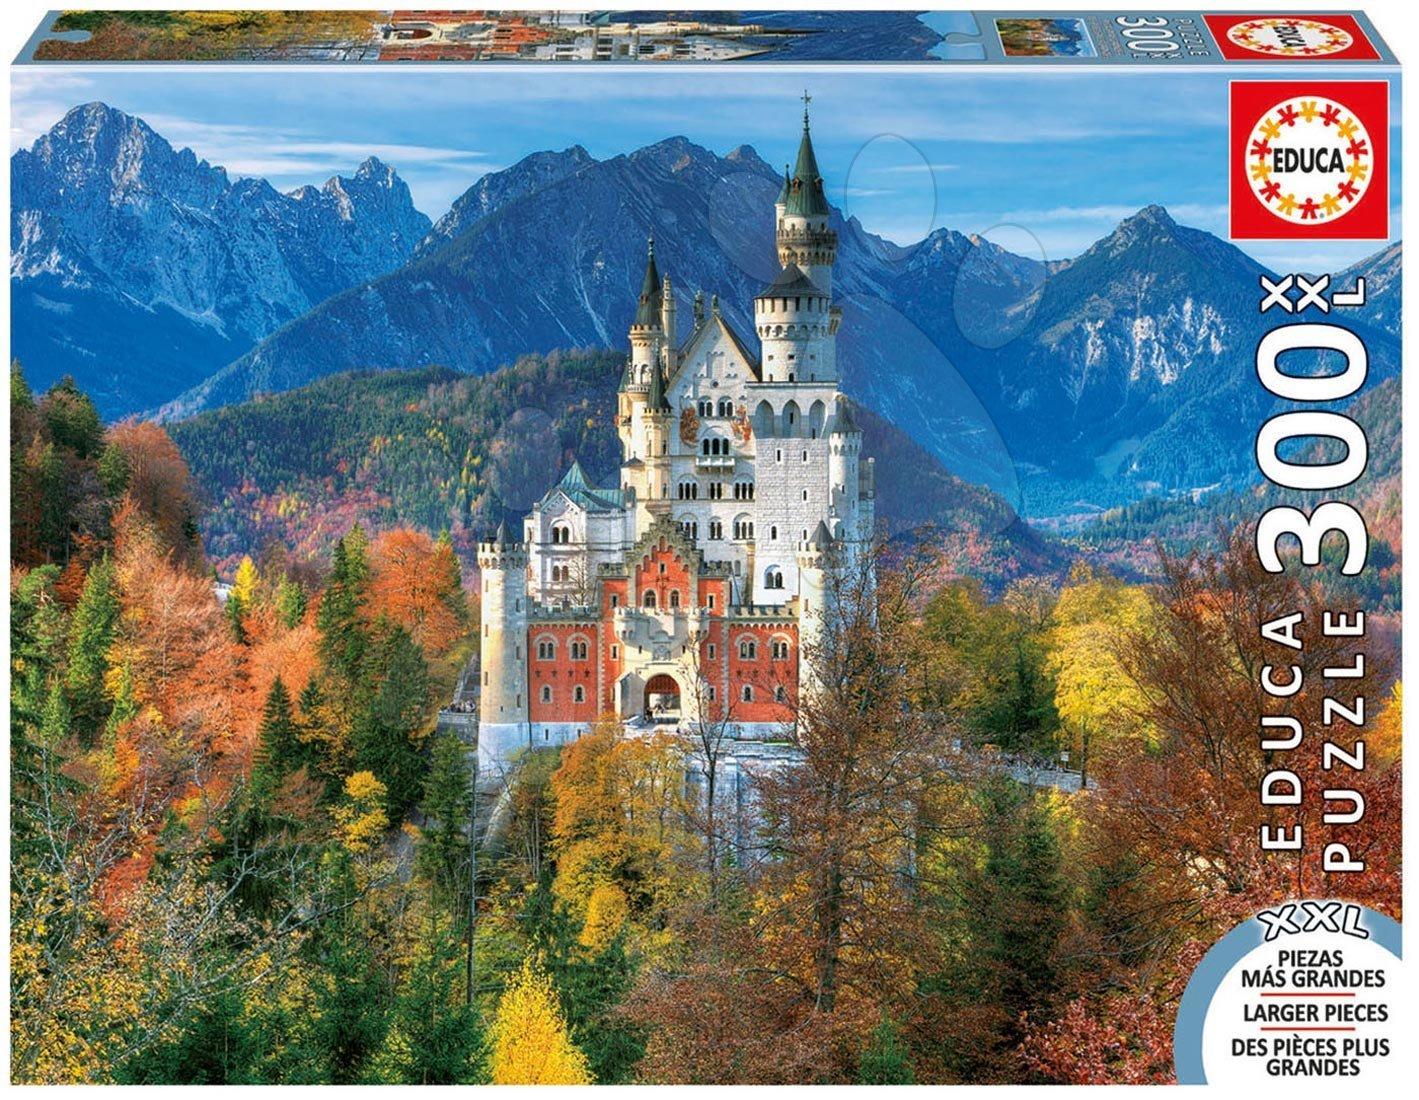 Puzzle 500 dielne - Puzzle Genuine XXL Zámok Neuschwanstein Educa 300 dielov od 12 rokov